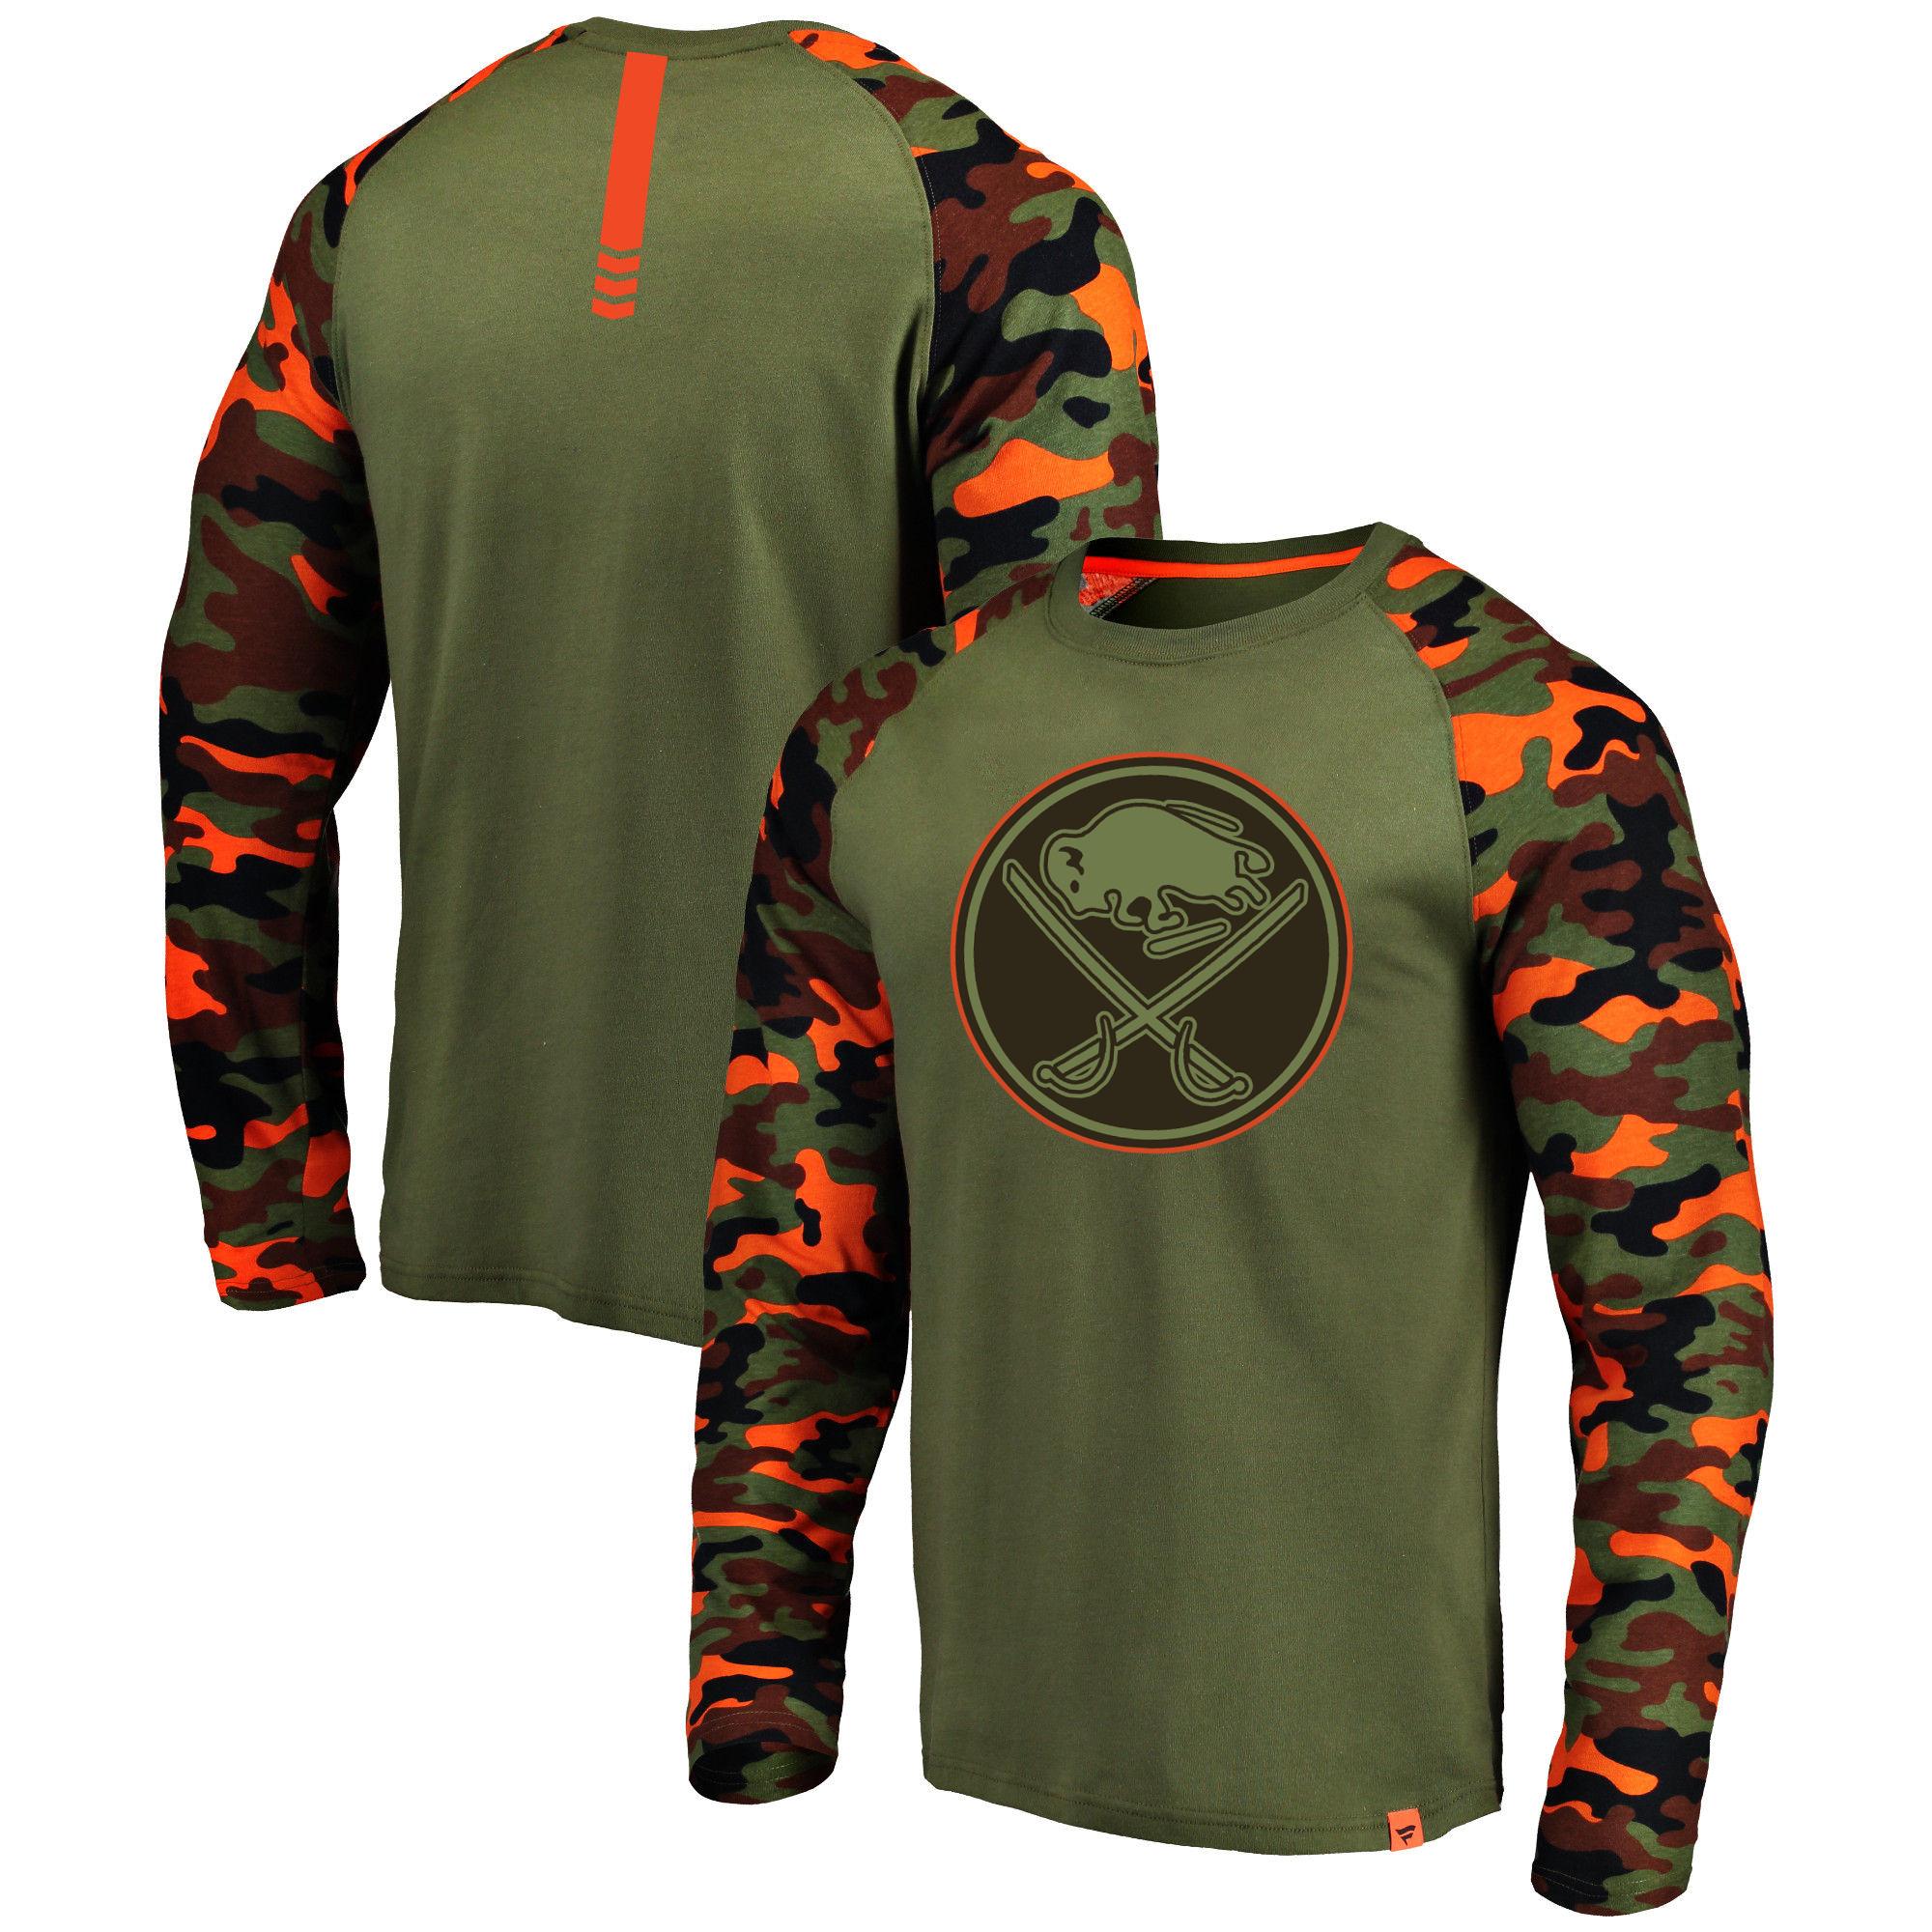 Buffalo Sabres Fanatics Branded Olive/Camo Recon Long Sleeve Raglan T-Shirt